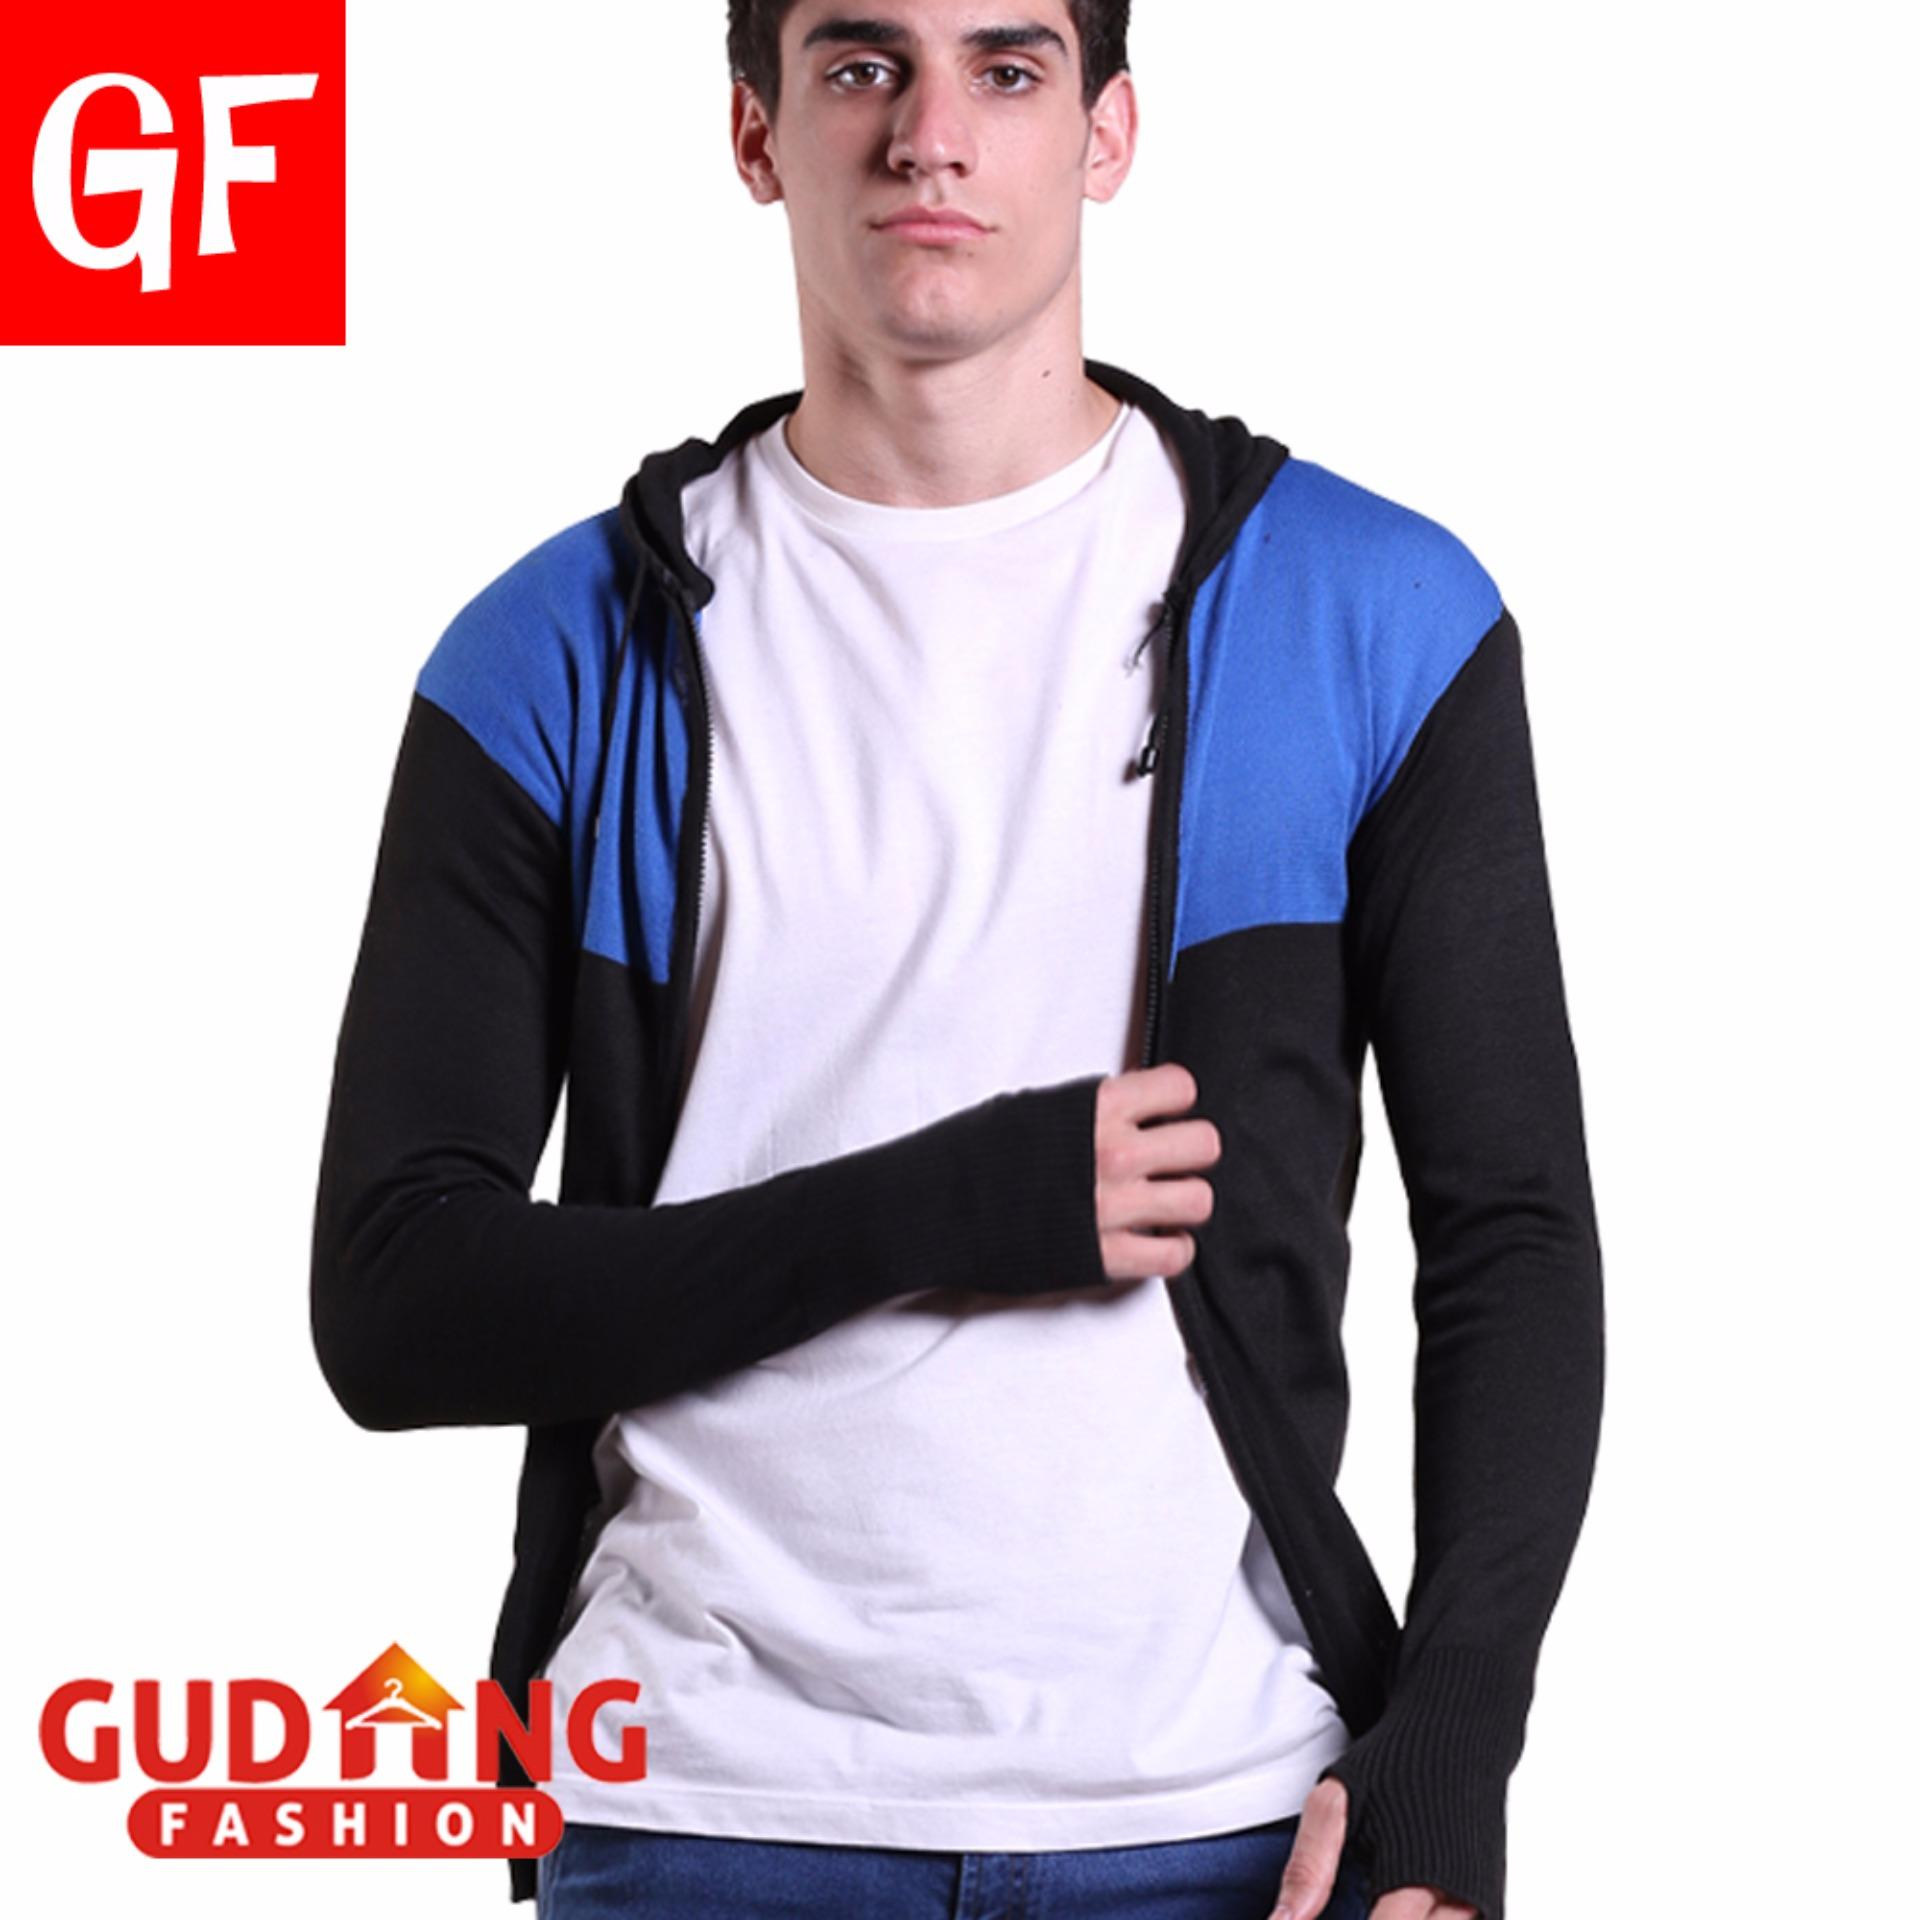 Promo Gudang Fashion Sweater Jaket Pria Kombinasi Warna